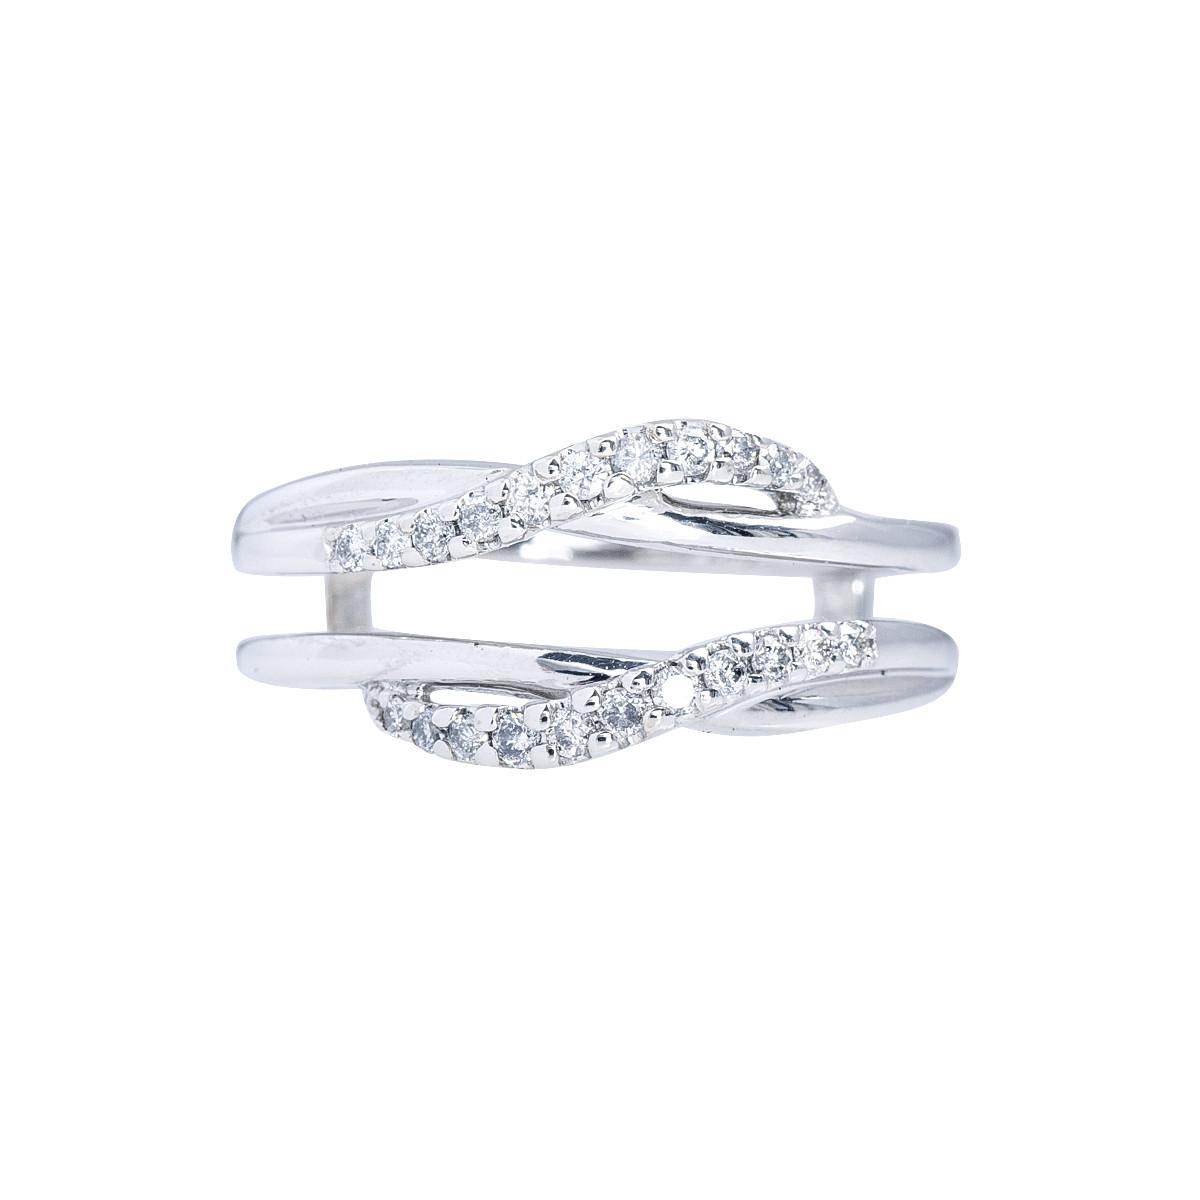 Vintage 0.11 CTW Diamond Ring Guard